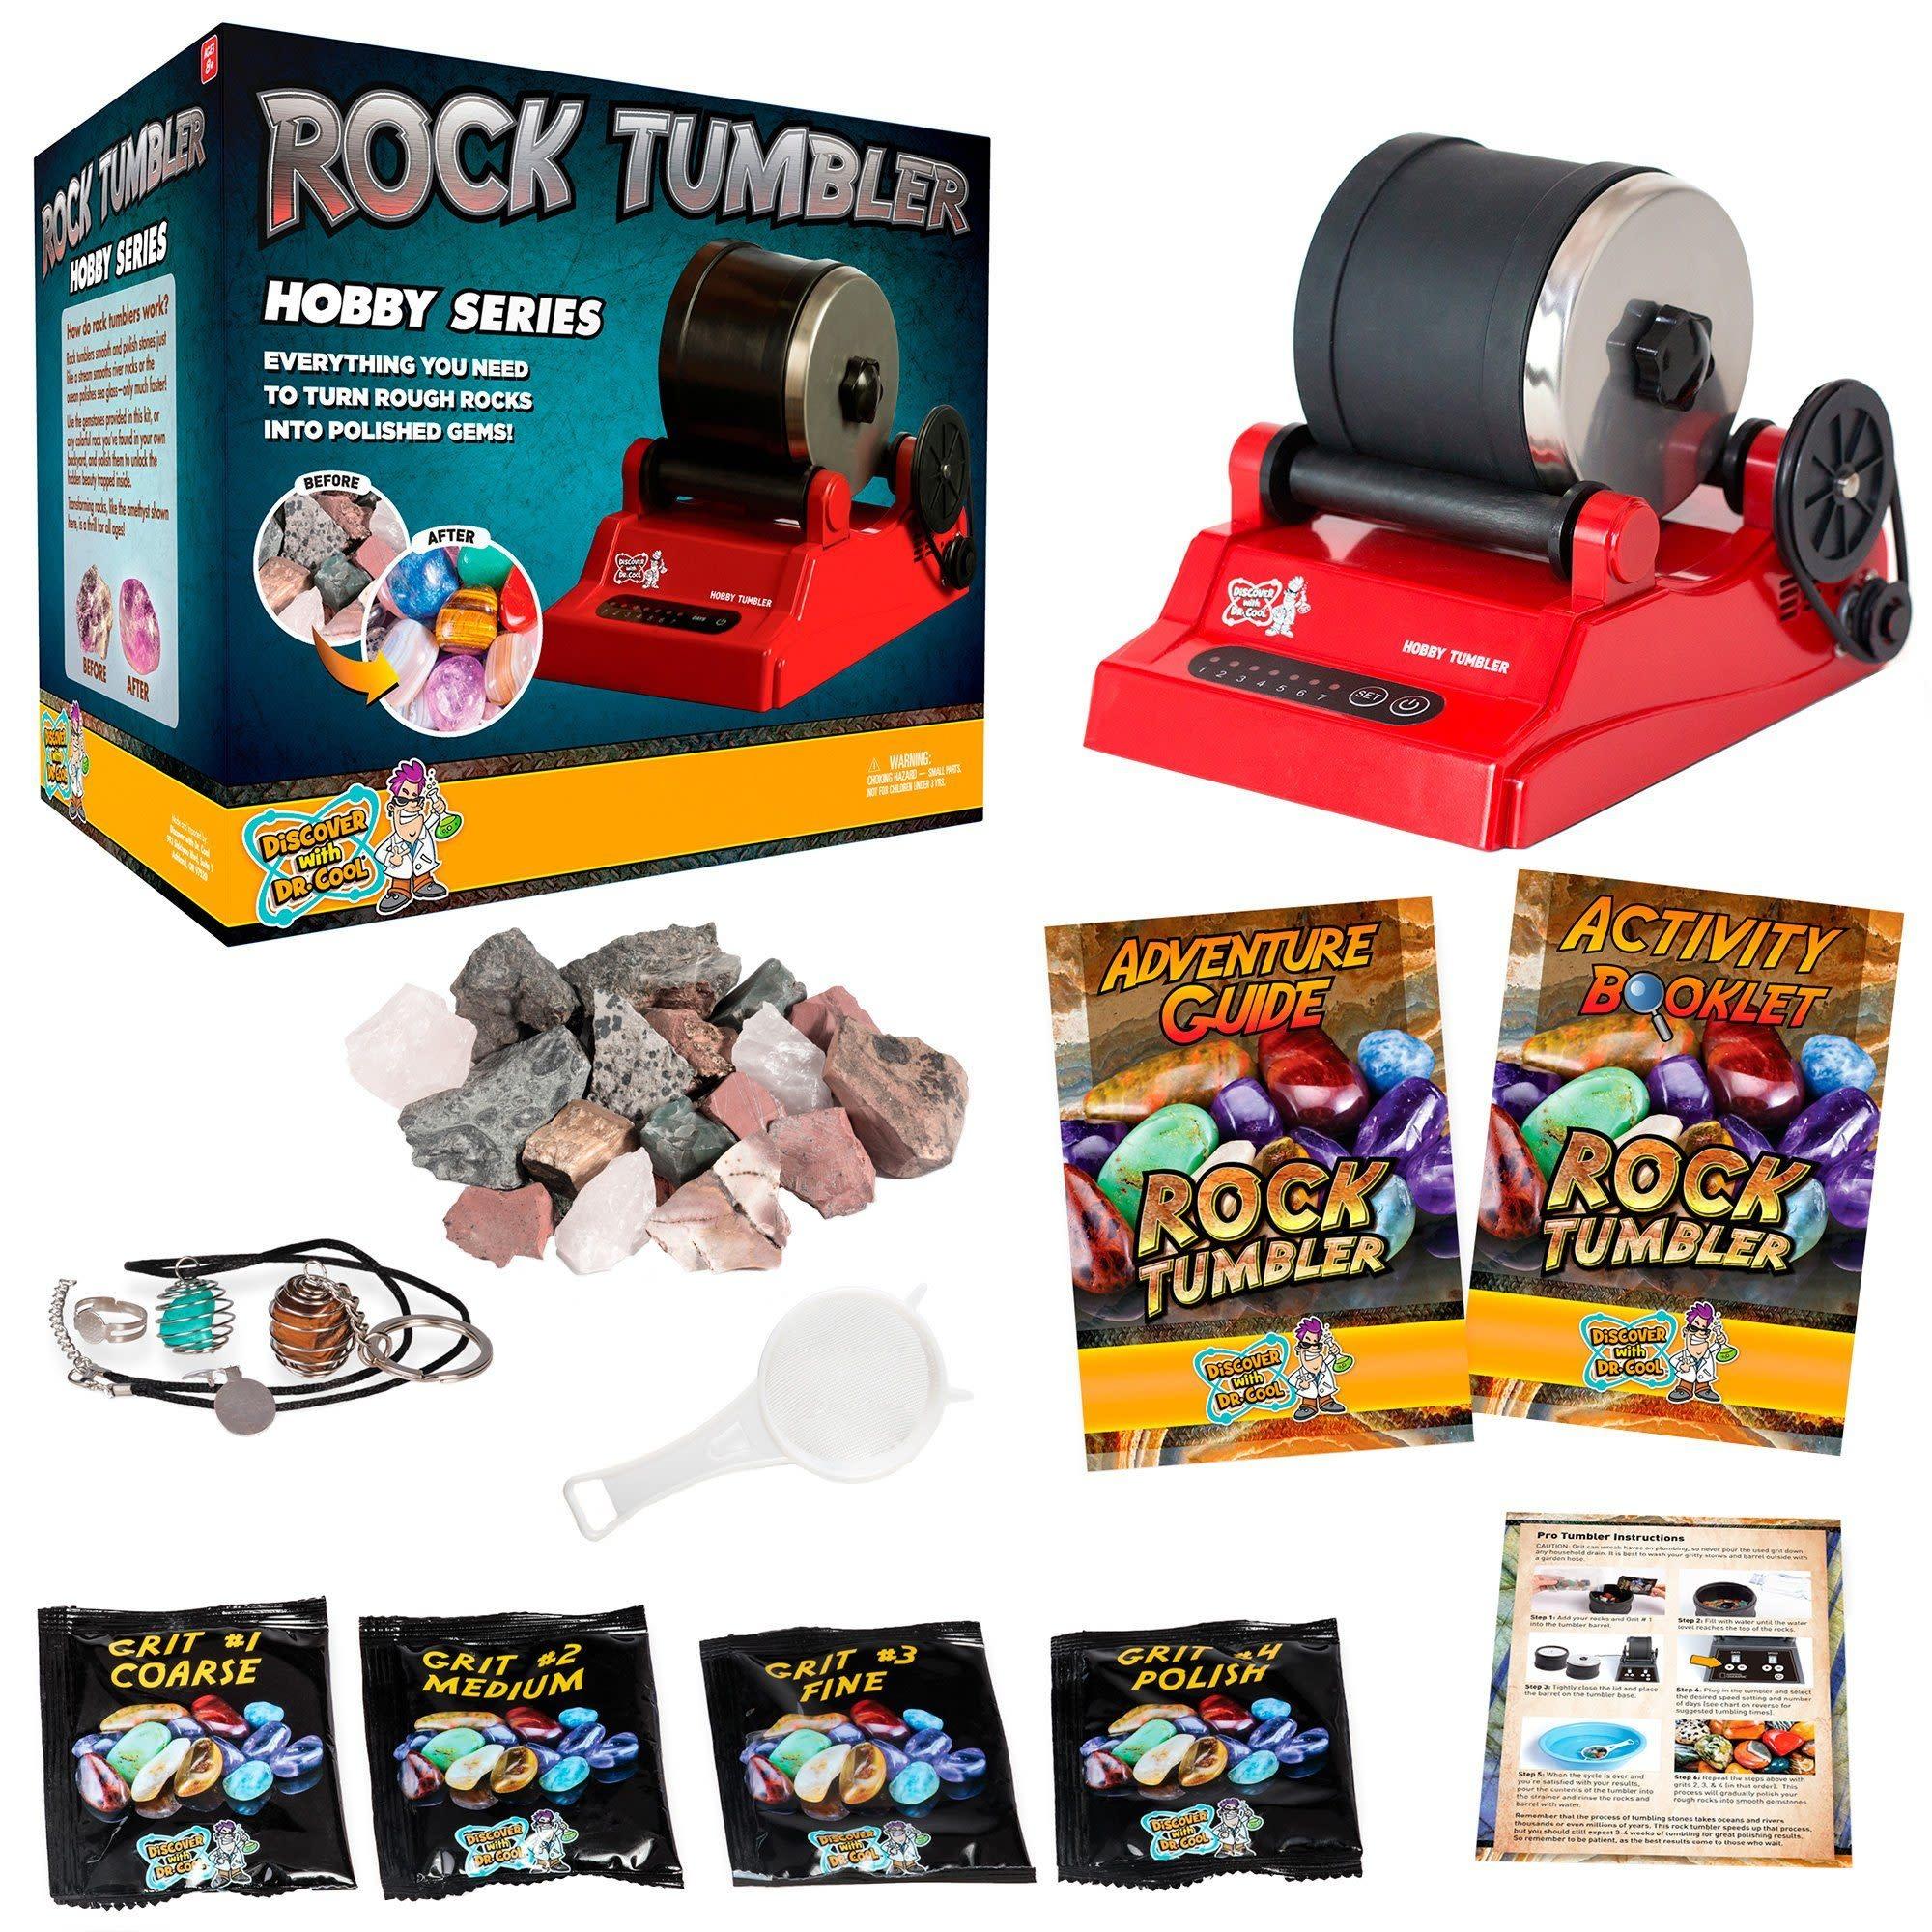 Rock Tumbler Hobby-2